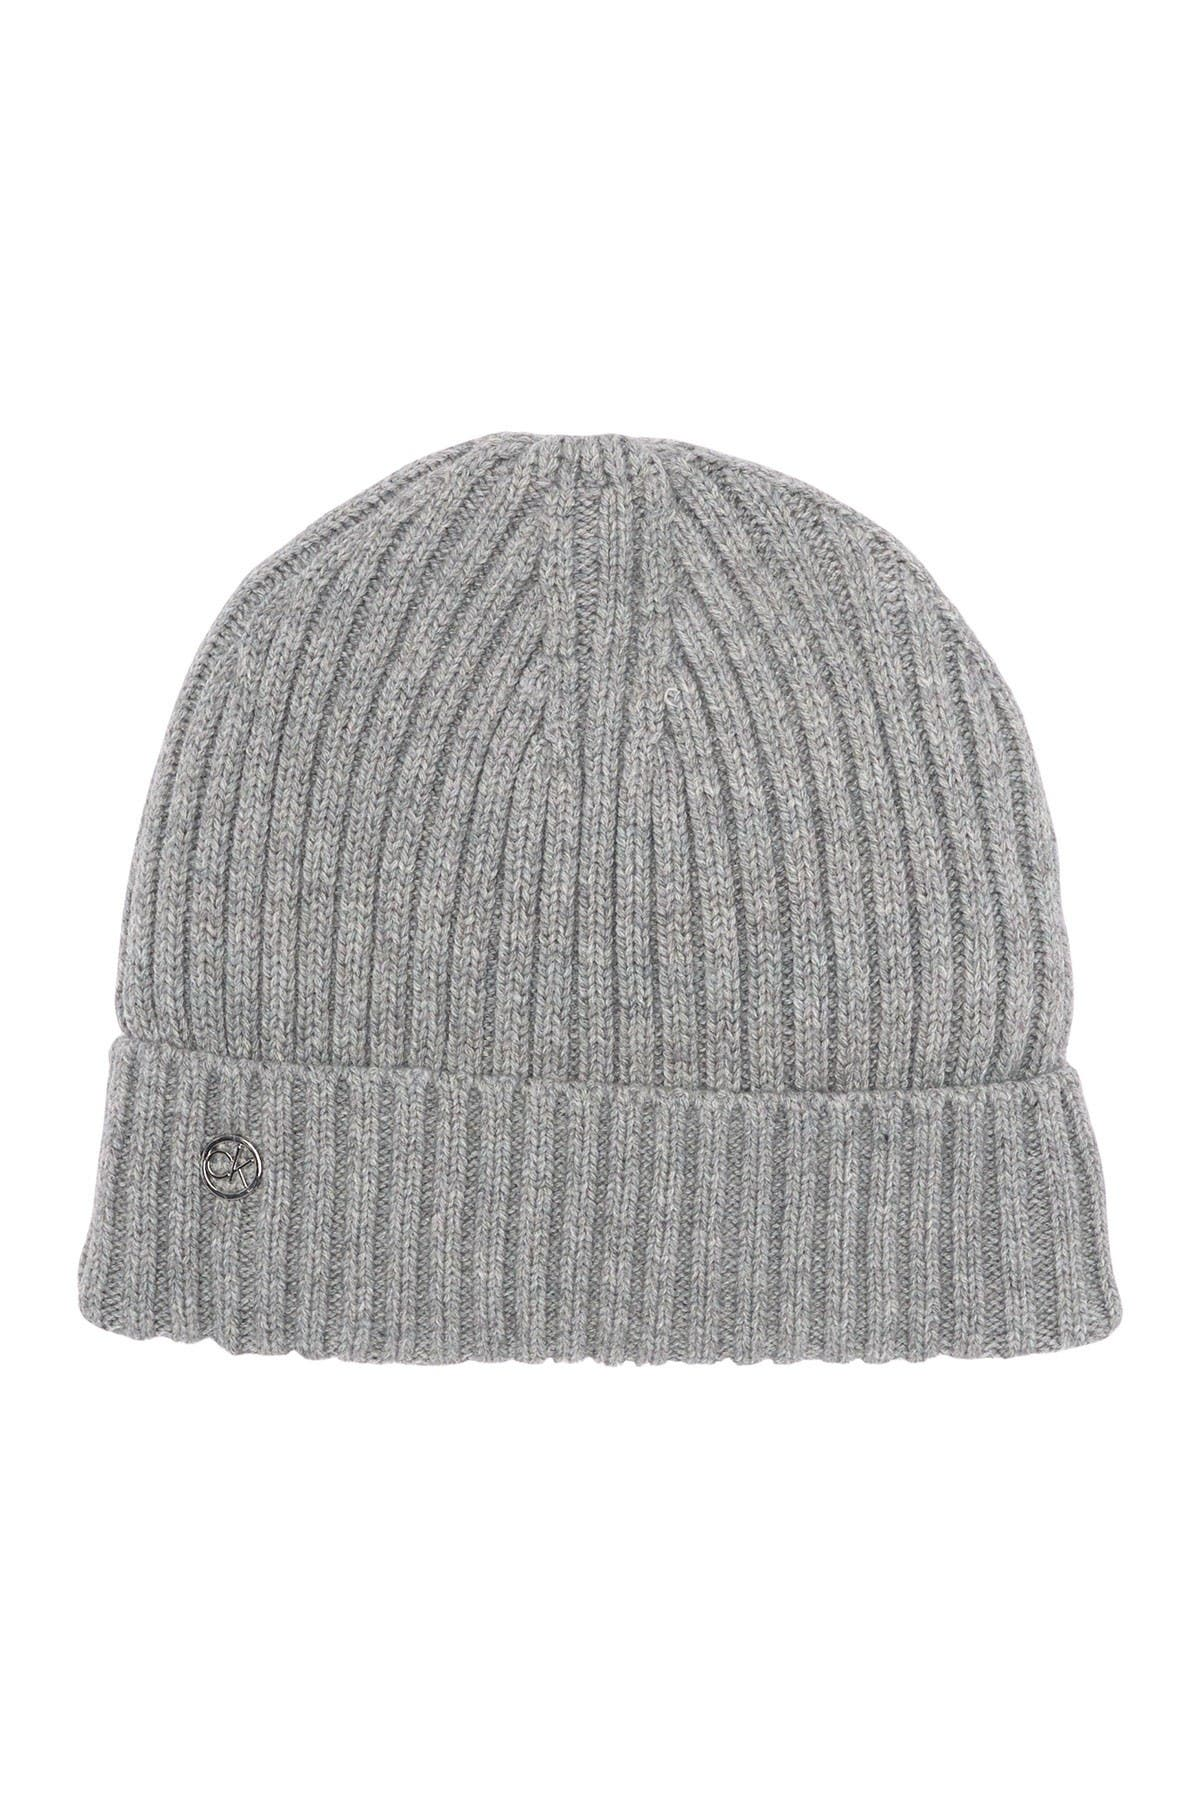 Image of Calvin Klein Plaited Logo Hat